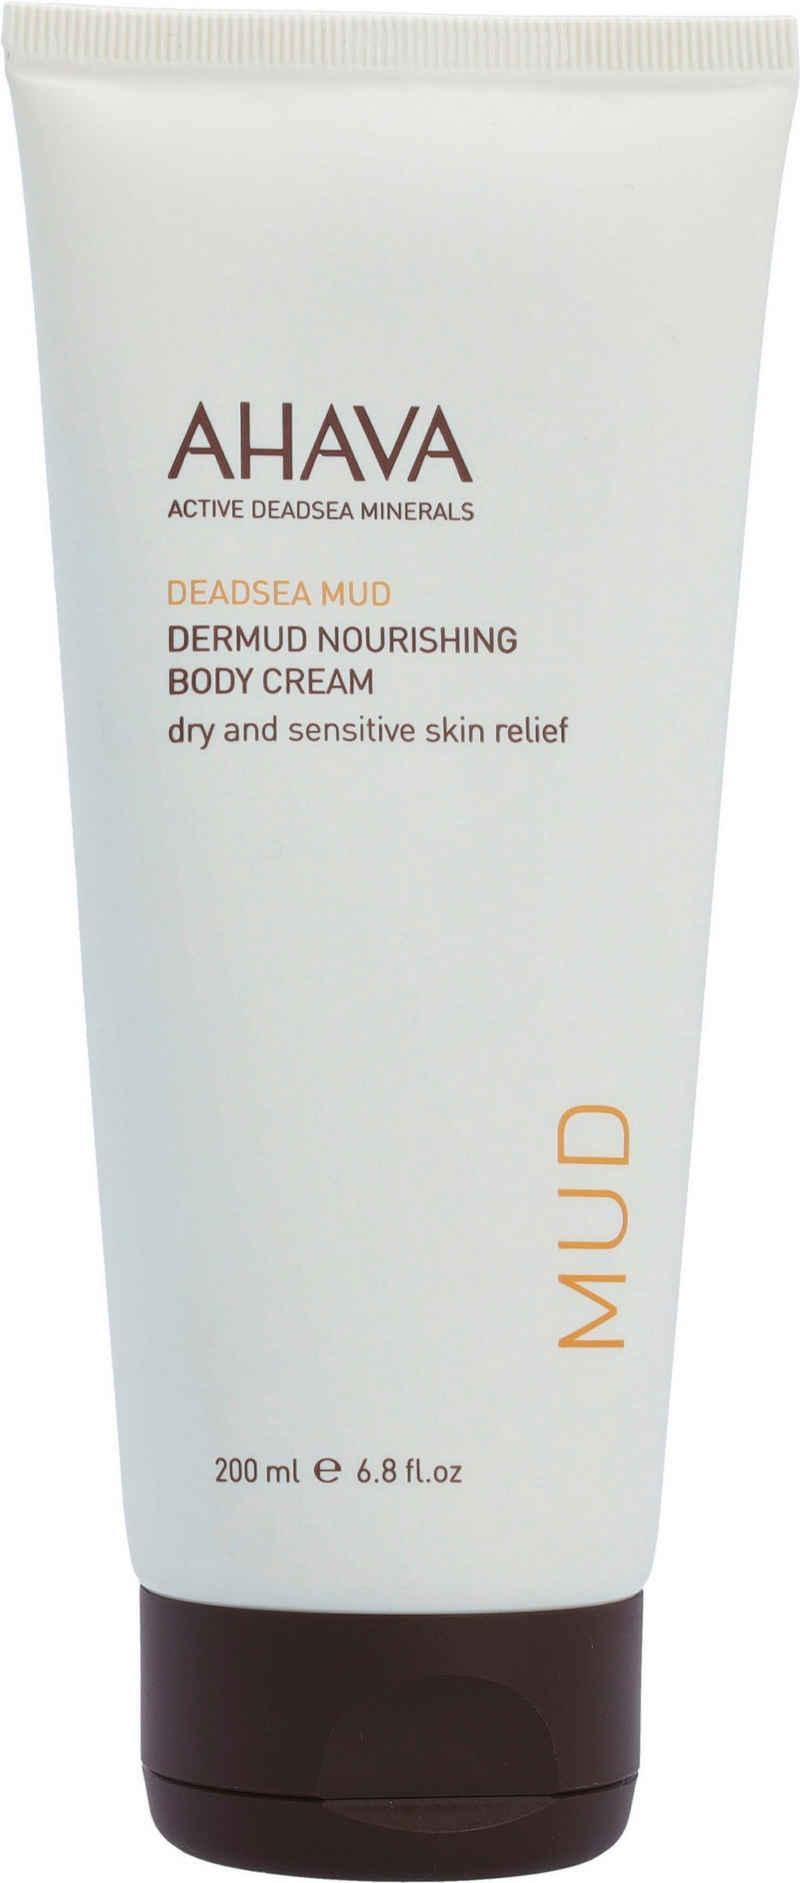 AHAVA Körpercreme »Deadsea Mud Dermud Nourishing Body Cream«